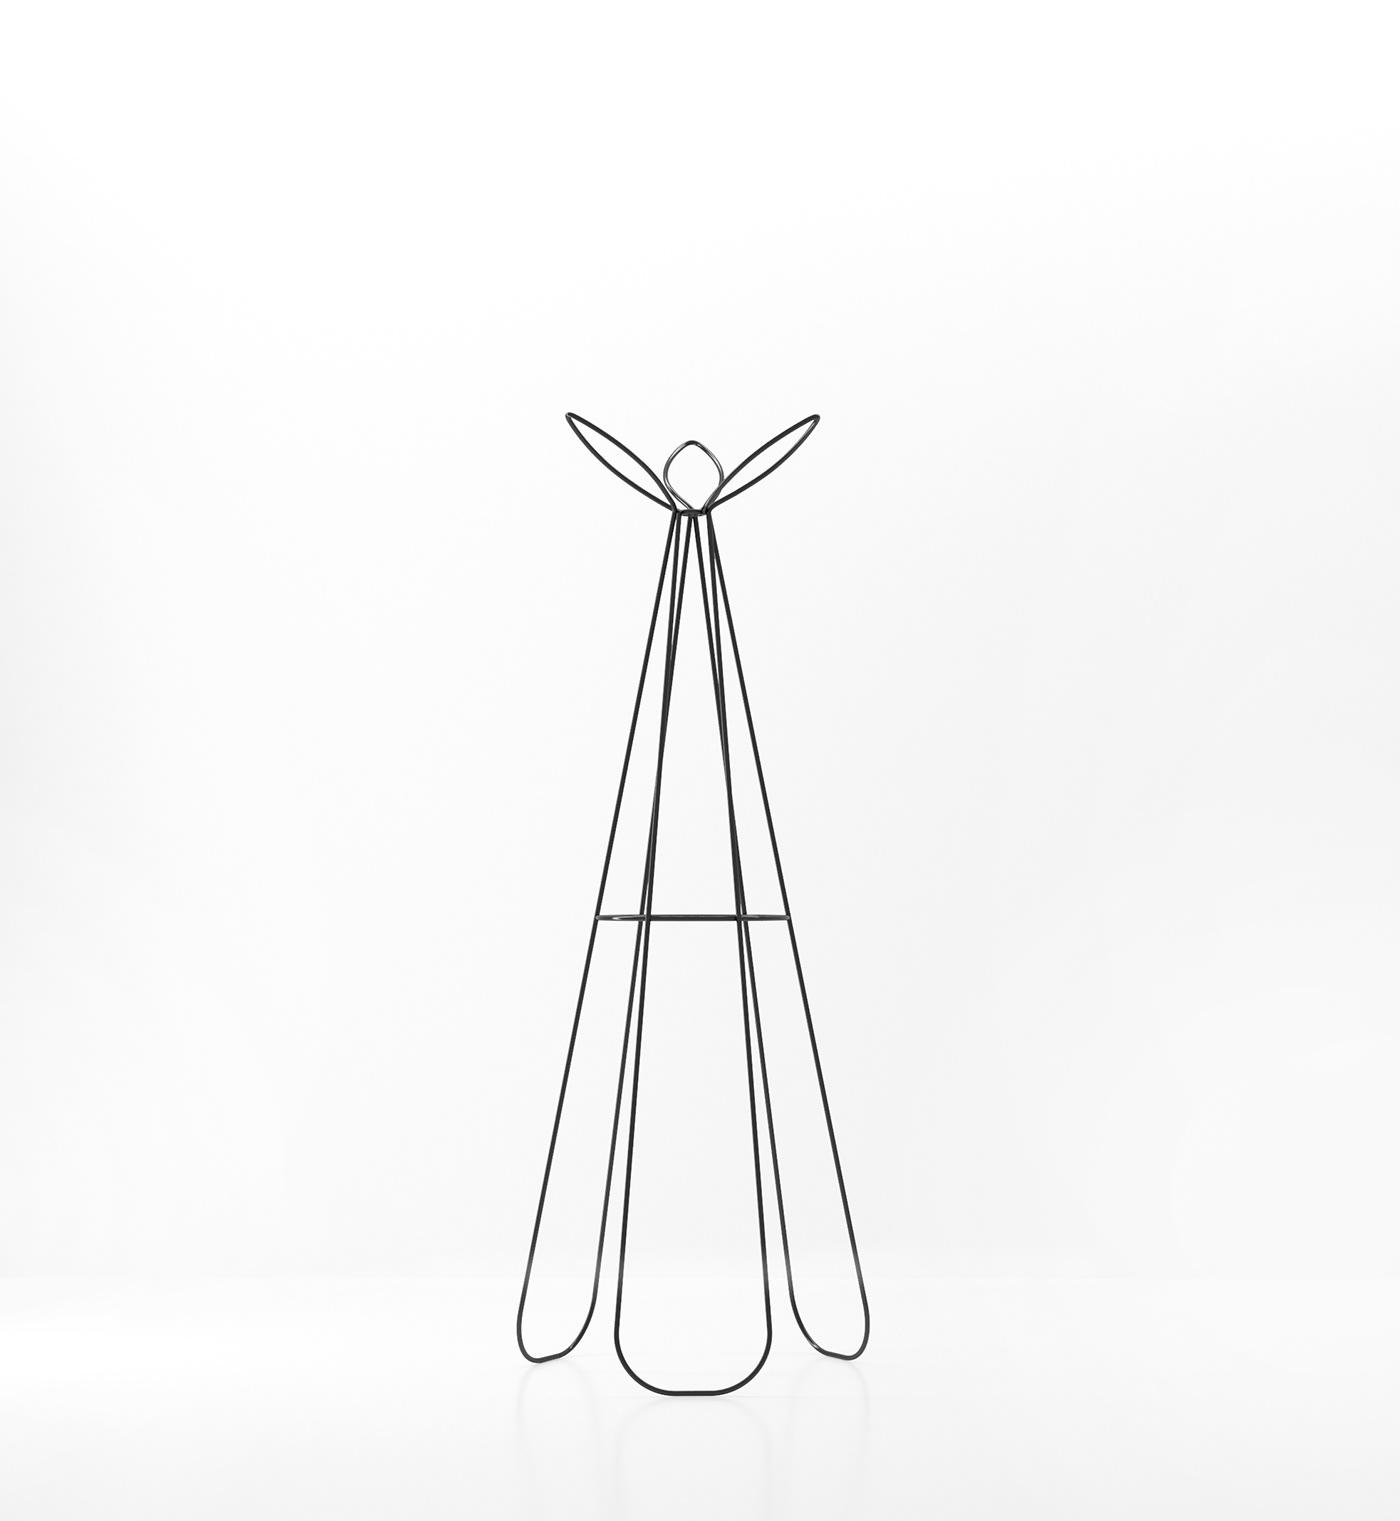 design,gomingir,hanger,rose,samoriz,samorizdesign,ukraine